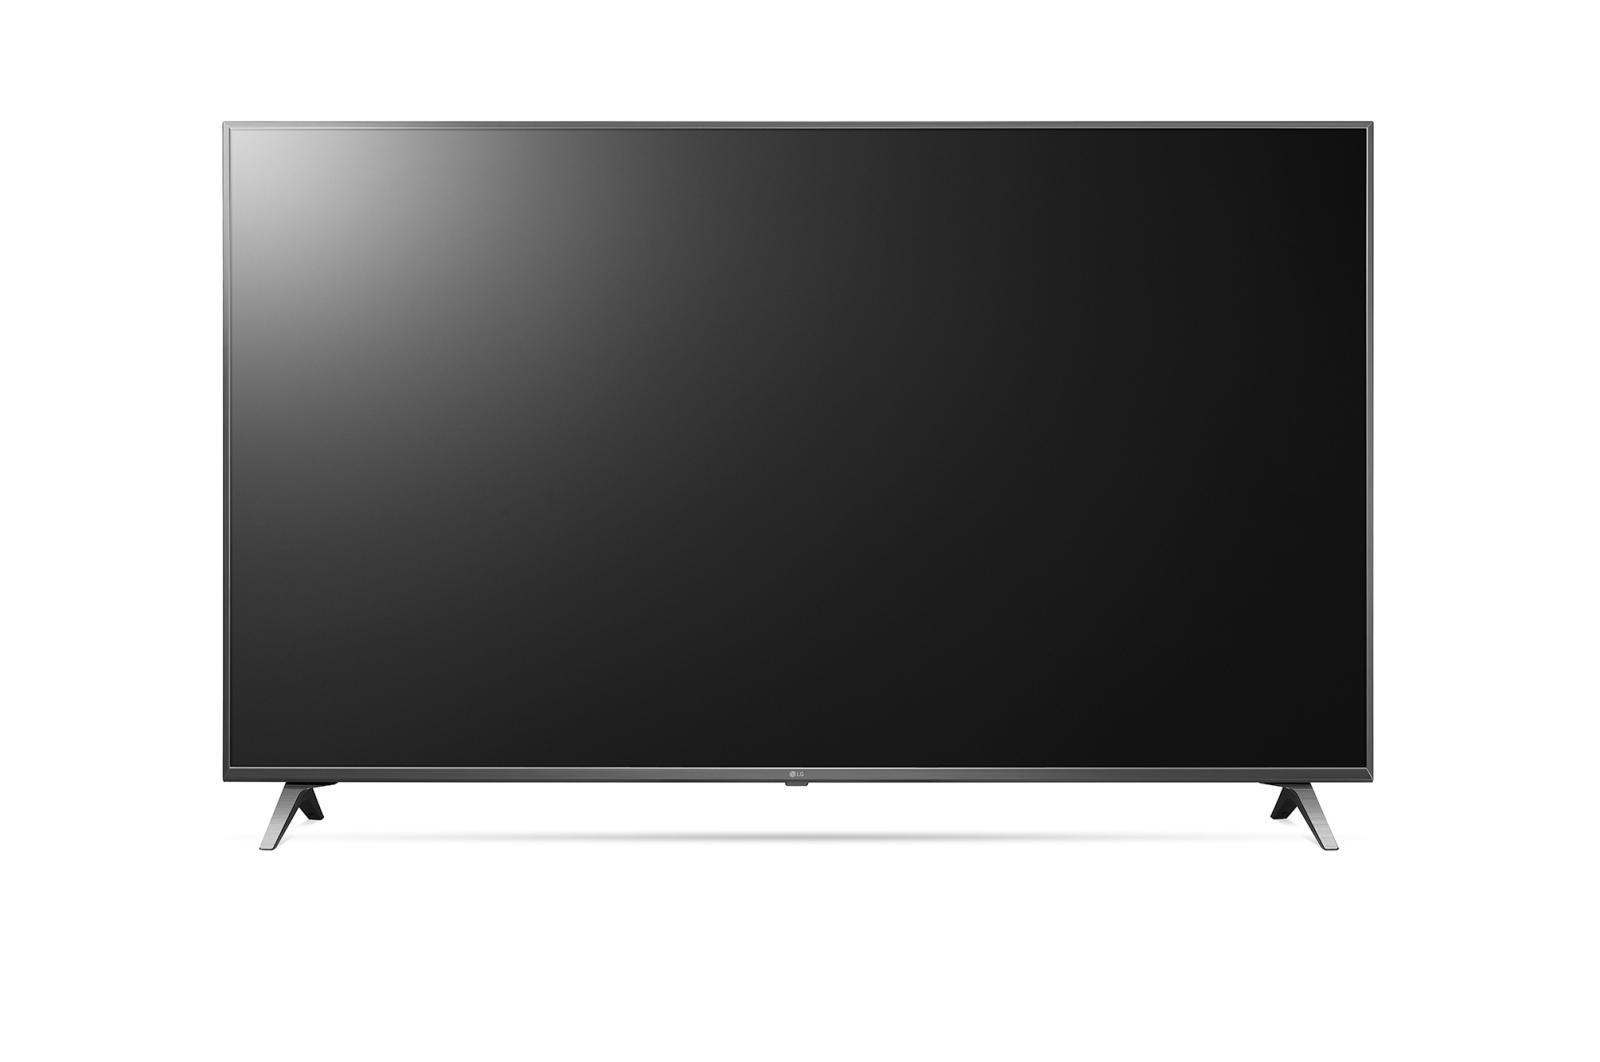 LG 65SK8000 telewizor 4k z AI